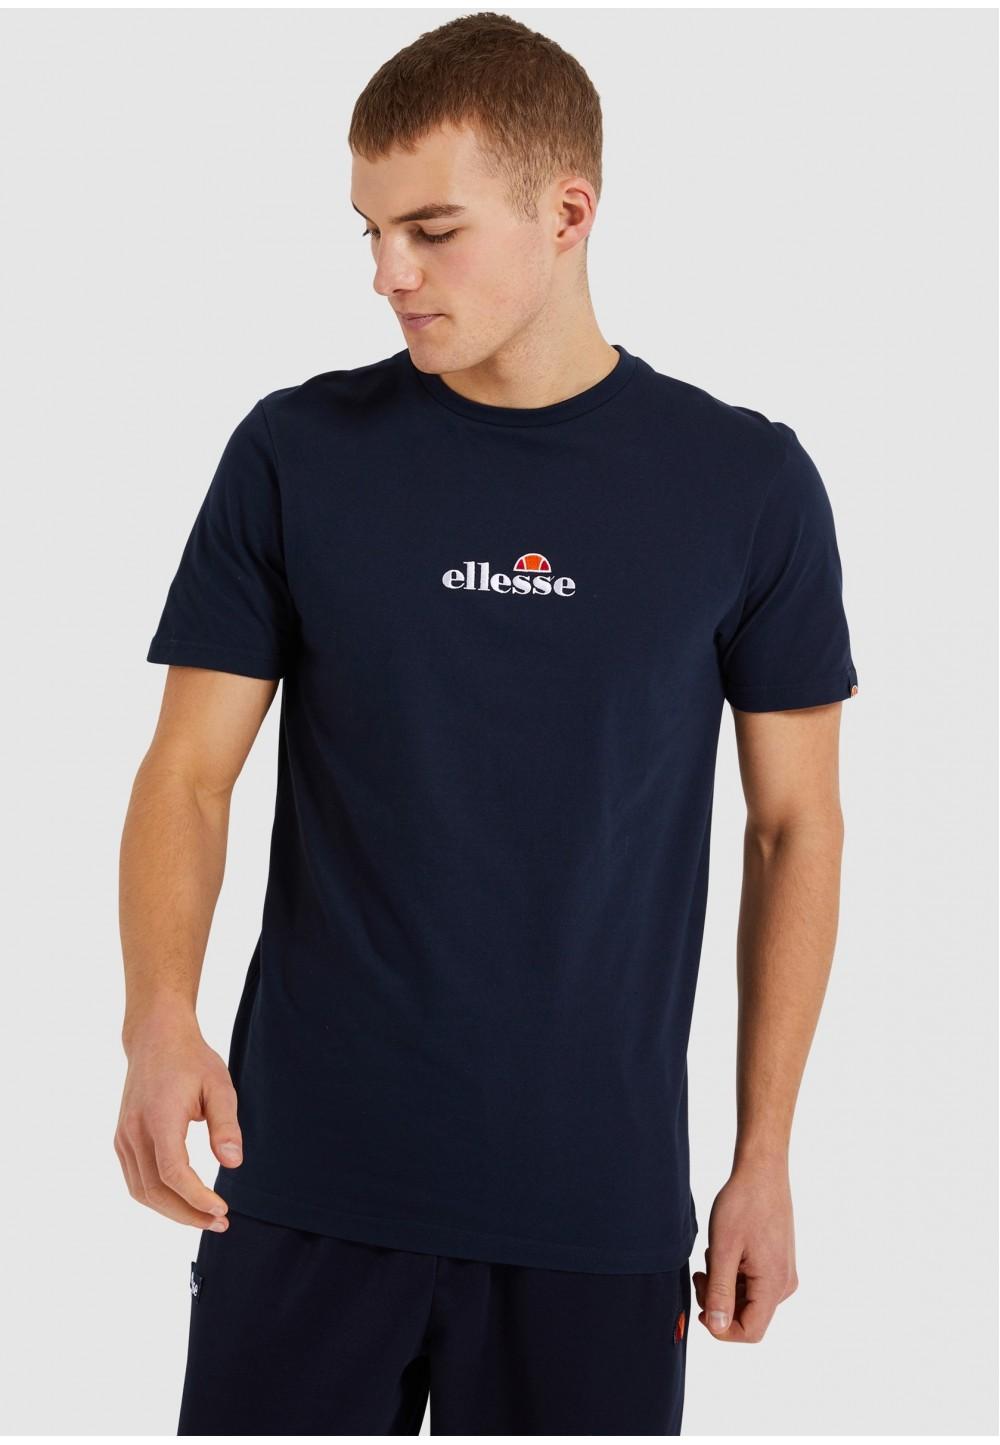 Синяя футболка с ярким логотипом на спине